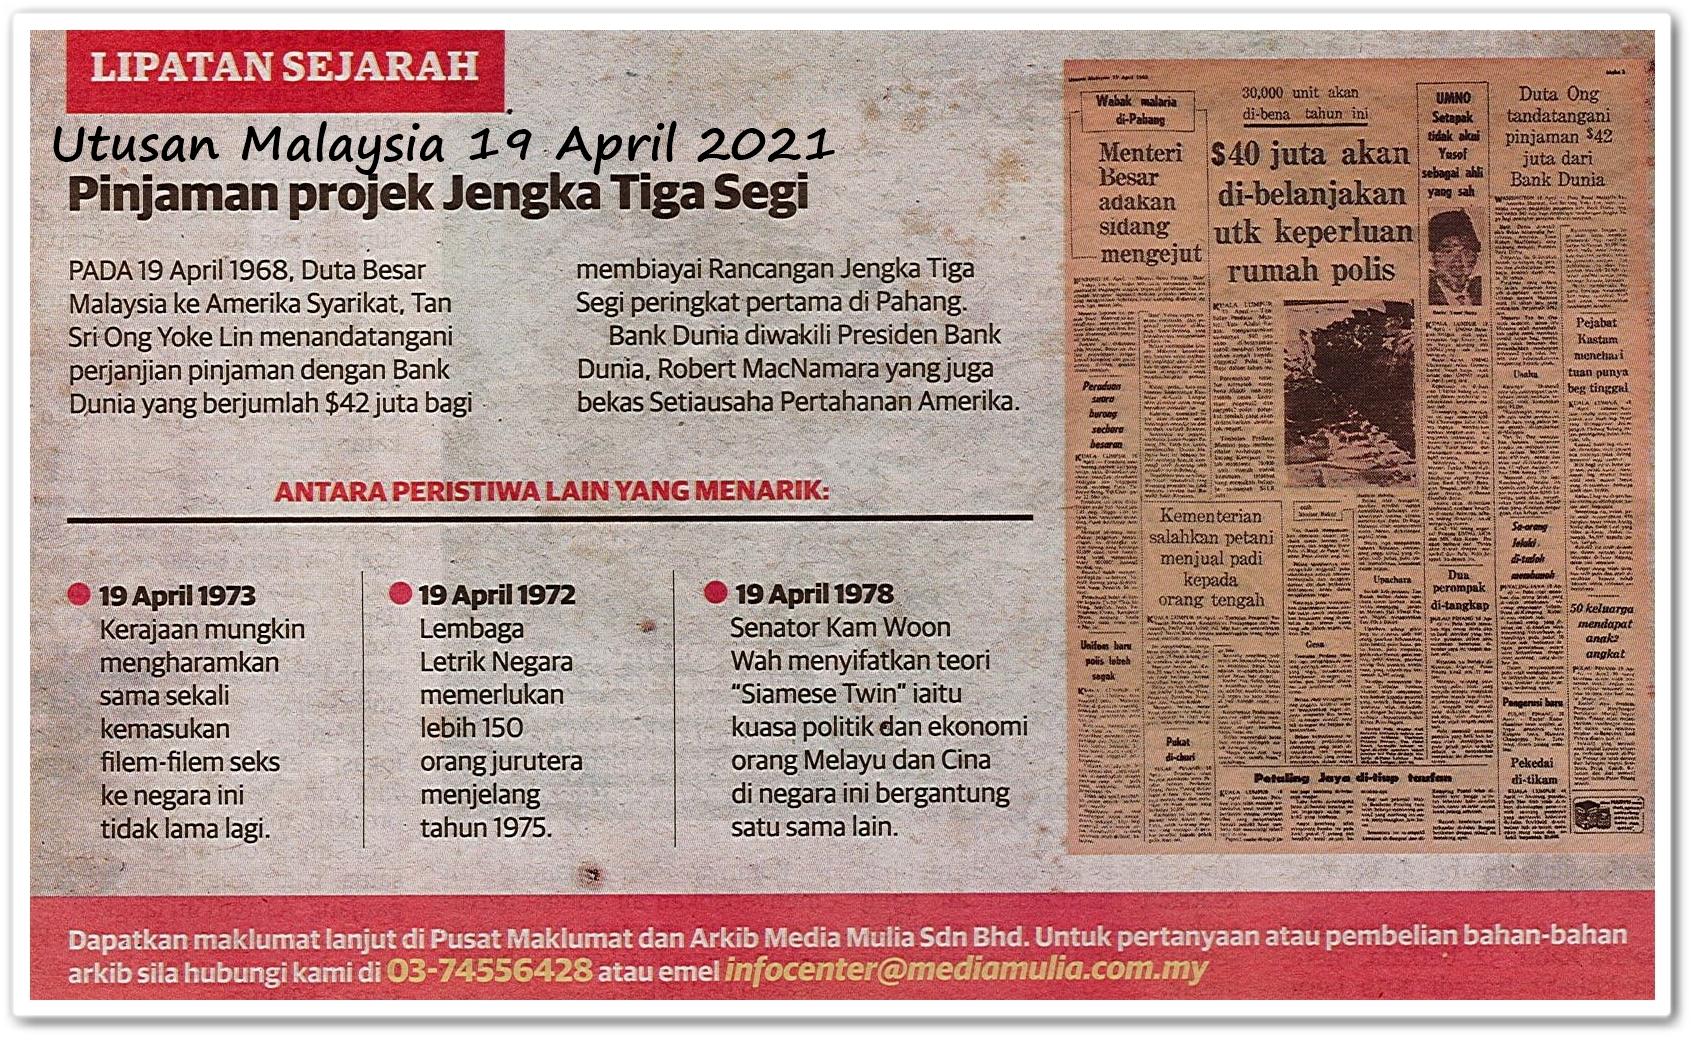 Lipatan sejarah 19 April - Keratan akhbar Utusan Malaysia 19 April 2021